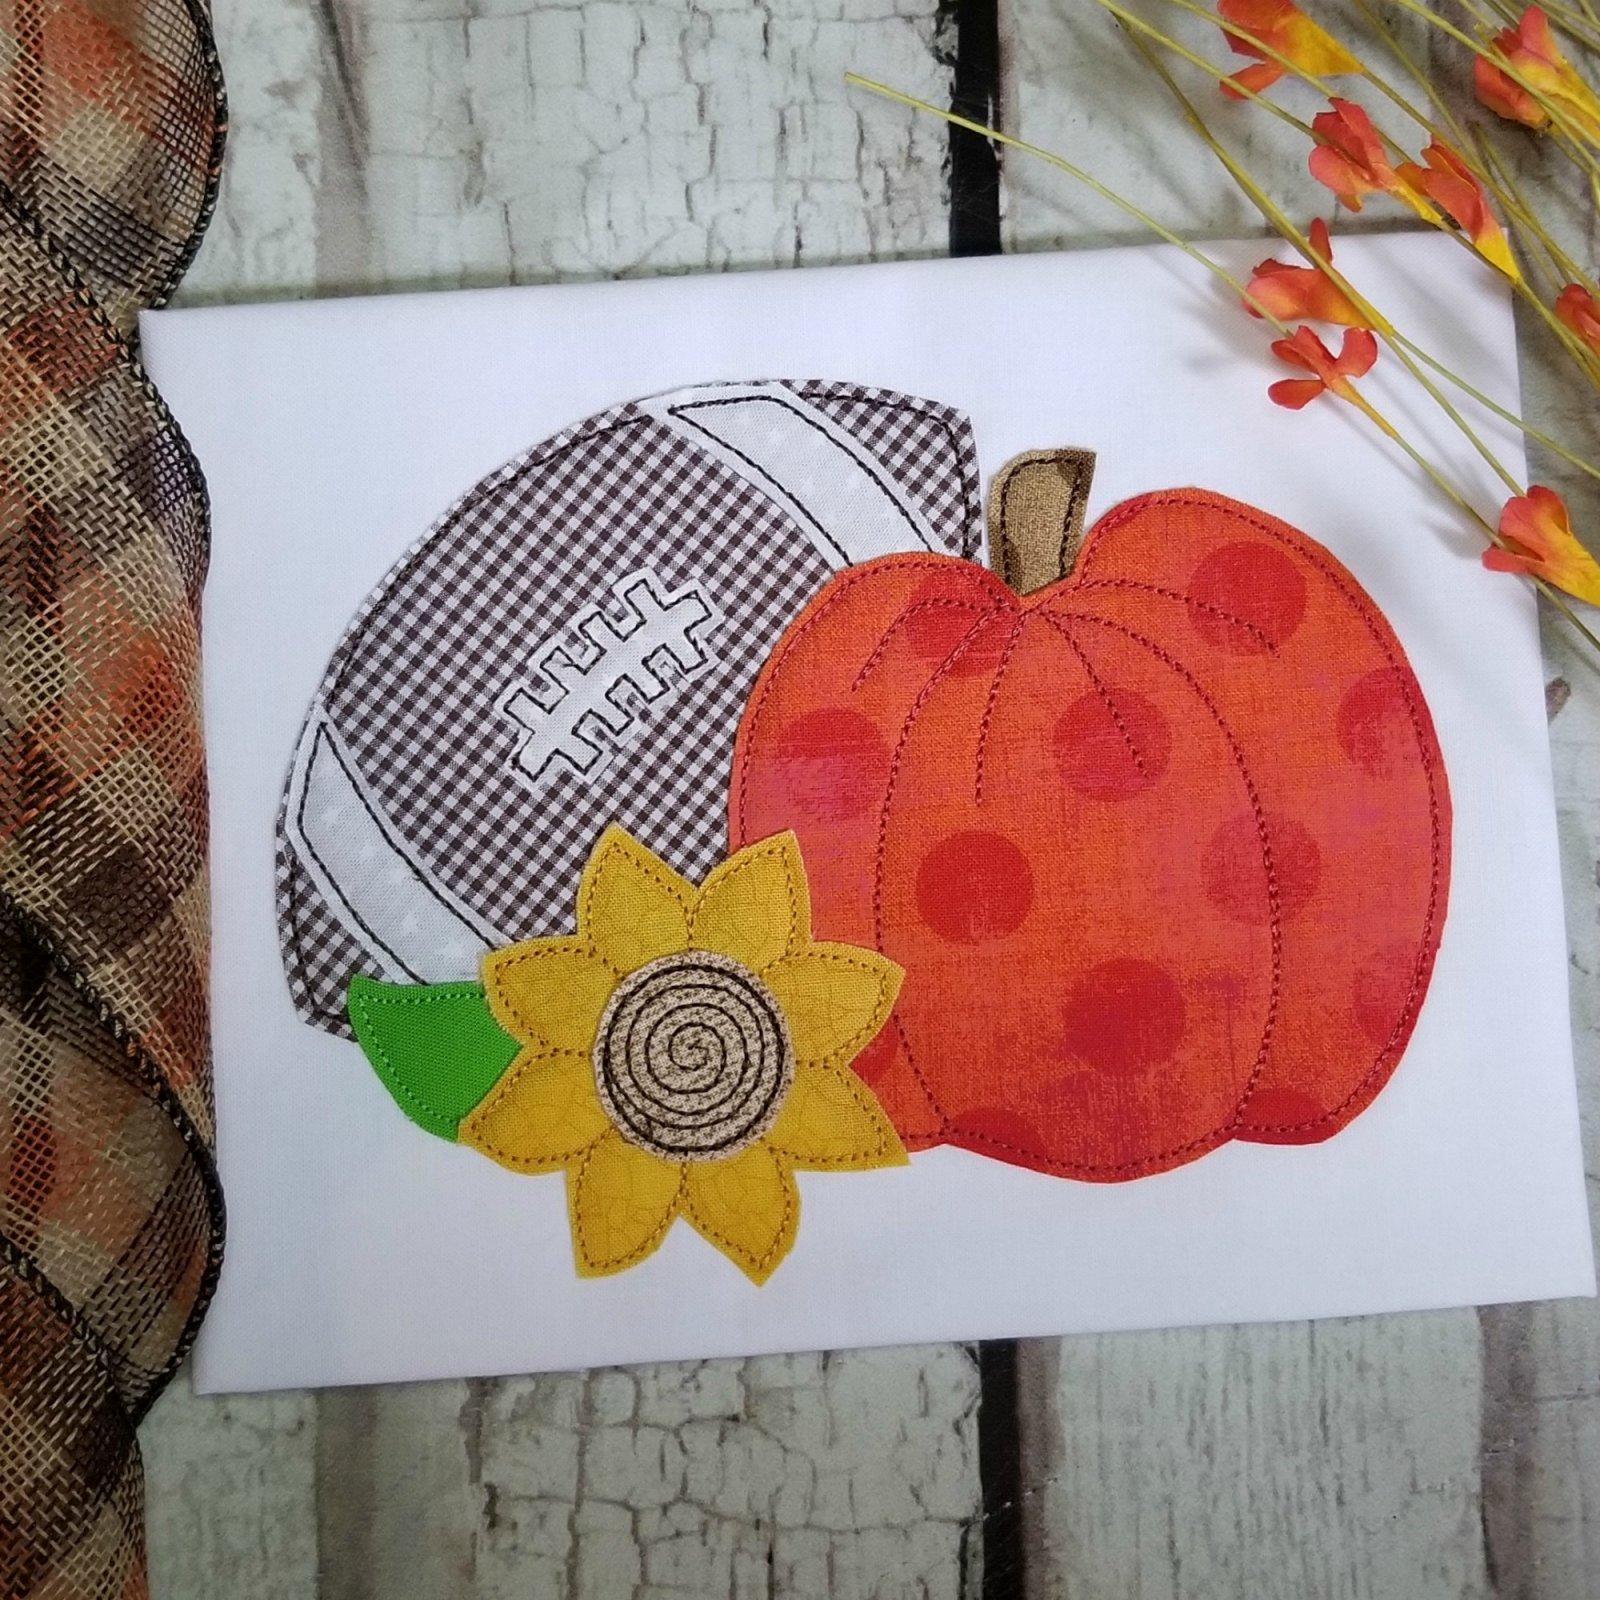 Pumpkin with Football and Sunflower Applique Design - Triple Stitch